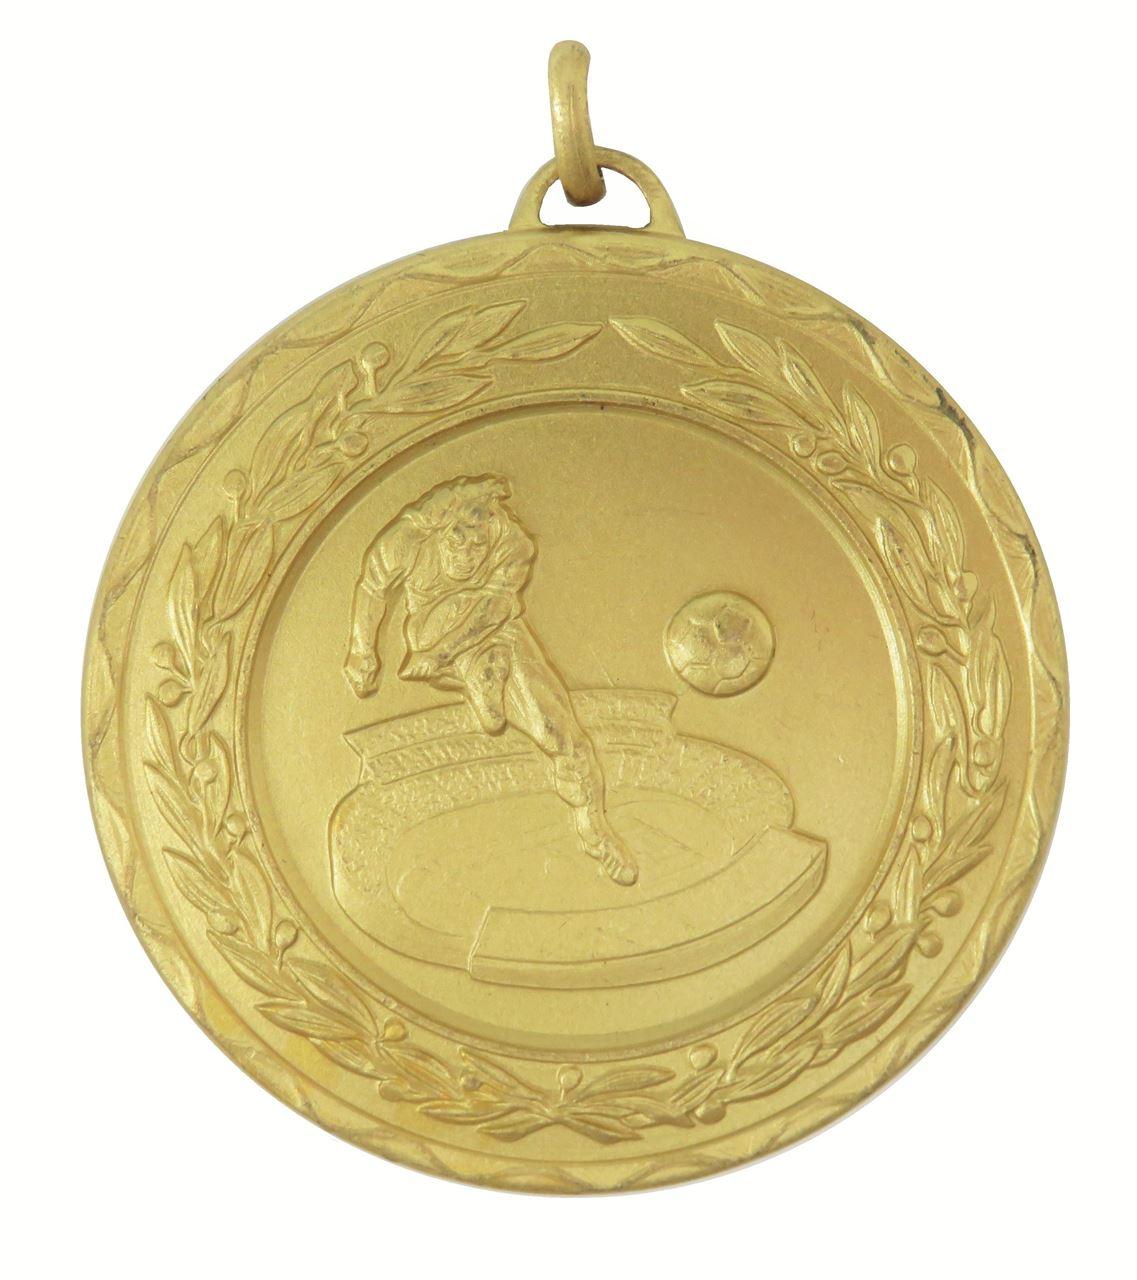 Gold Laurel Economy Football Stadium Medal (size: 50mm) - 4035E